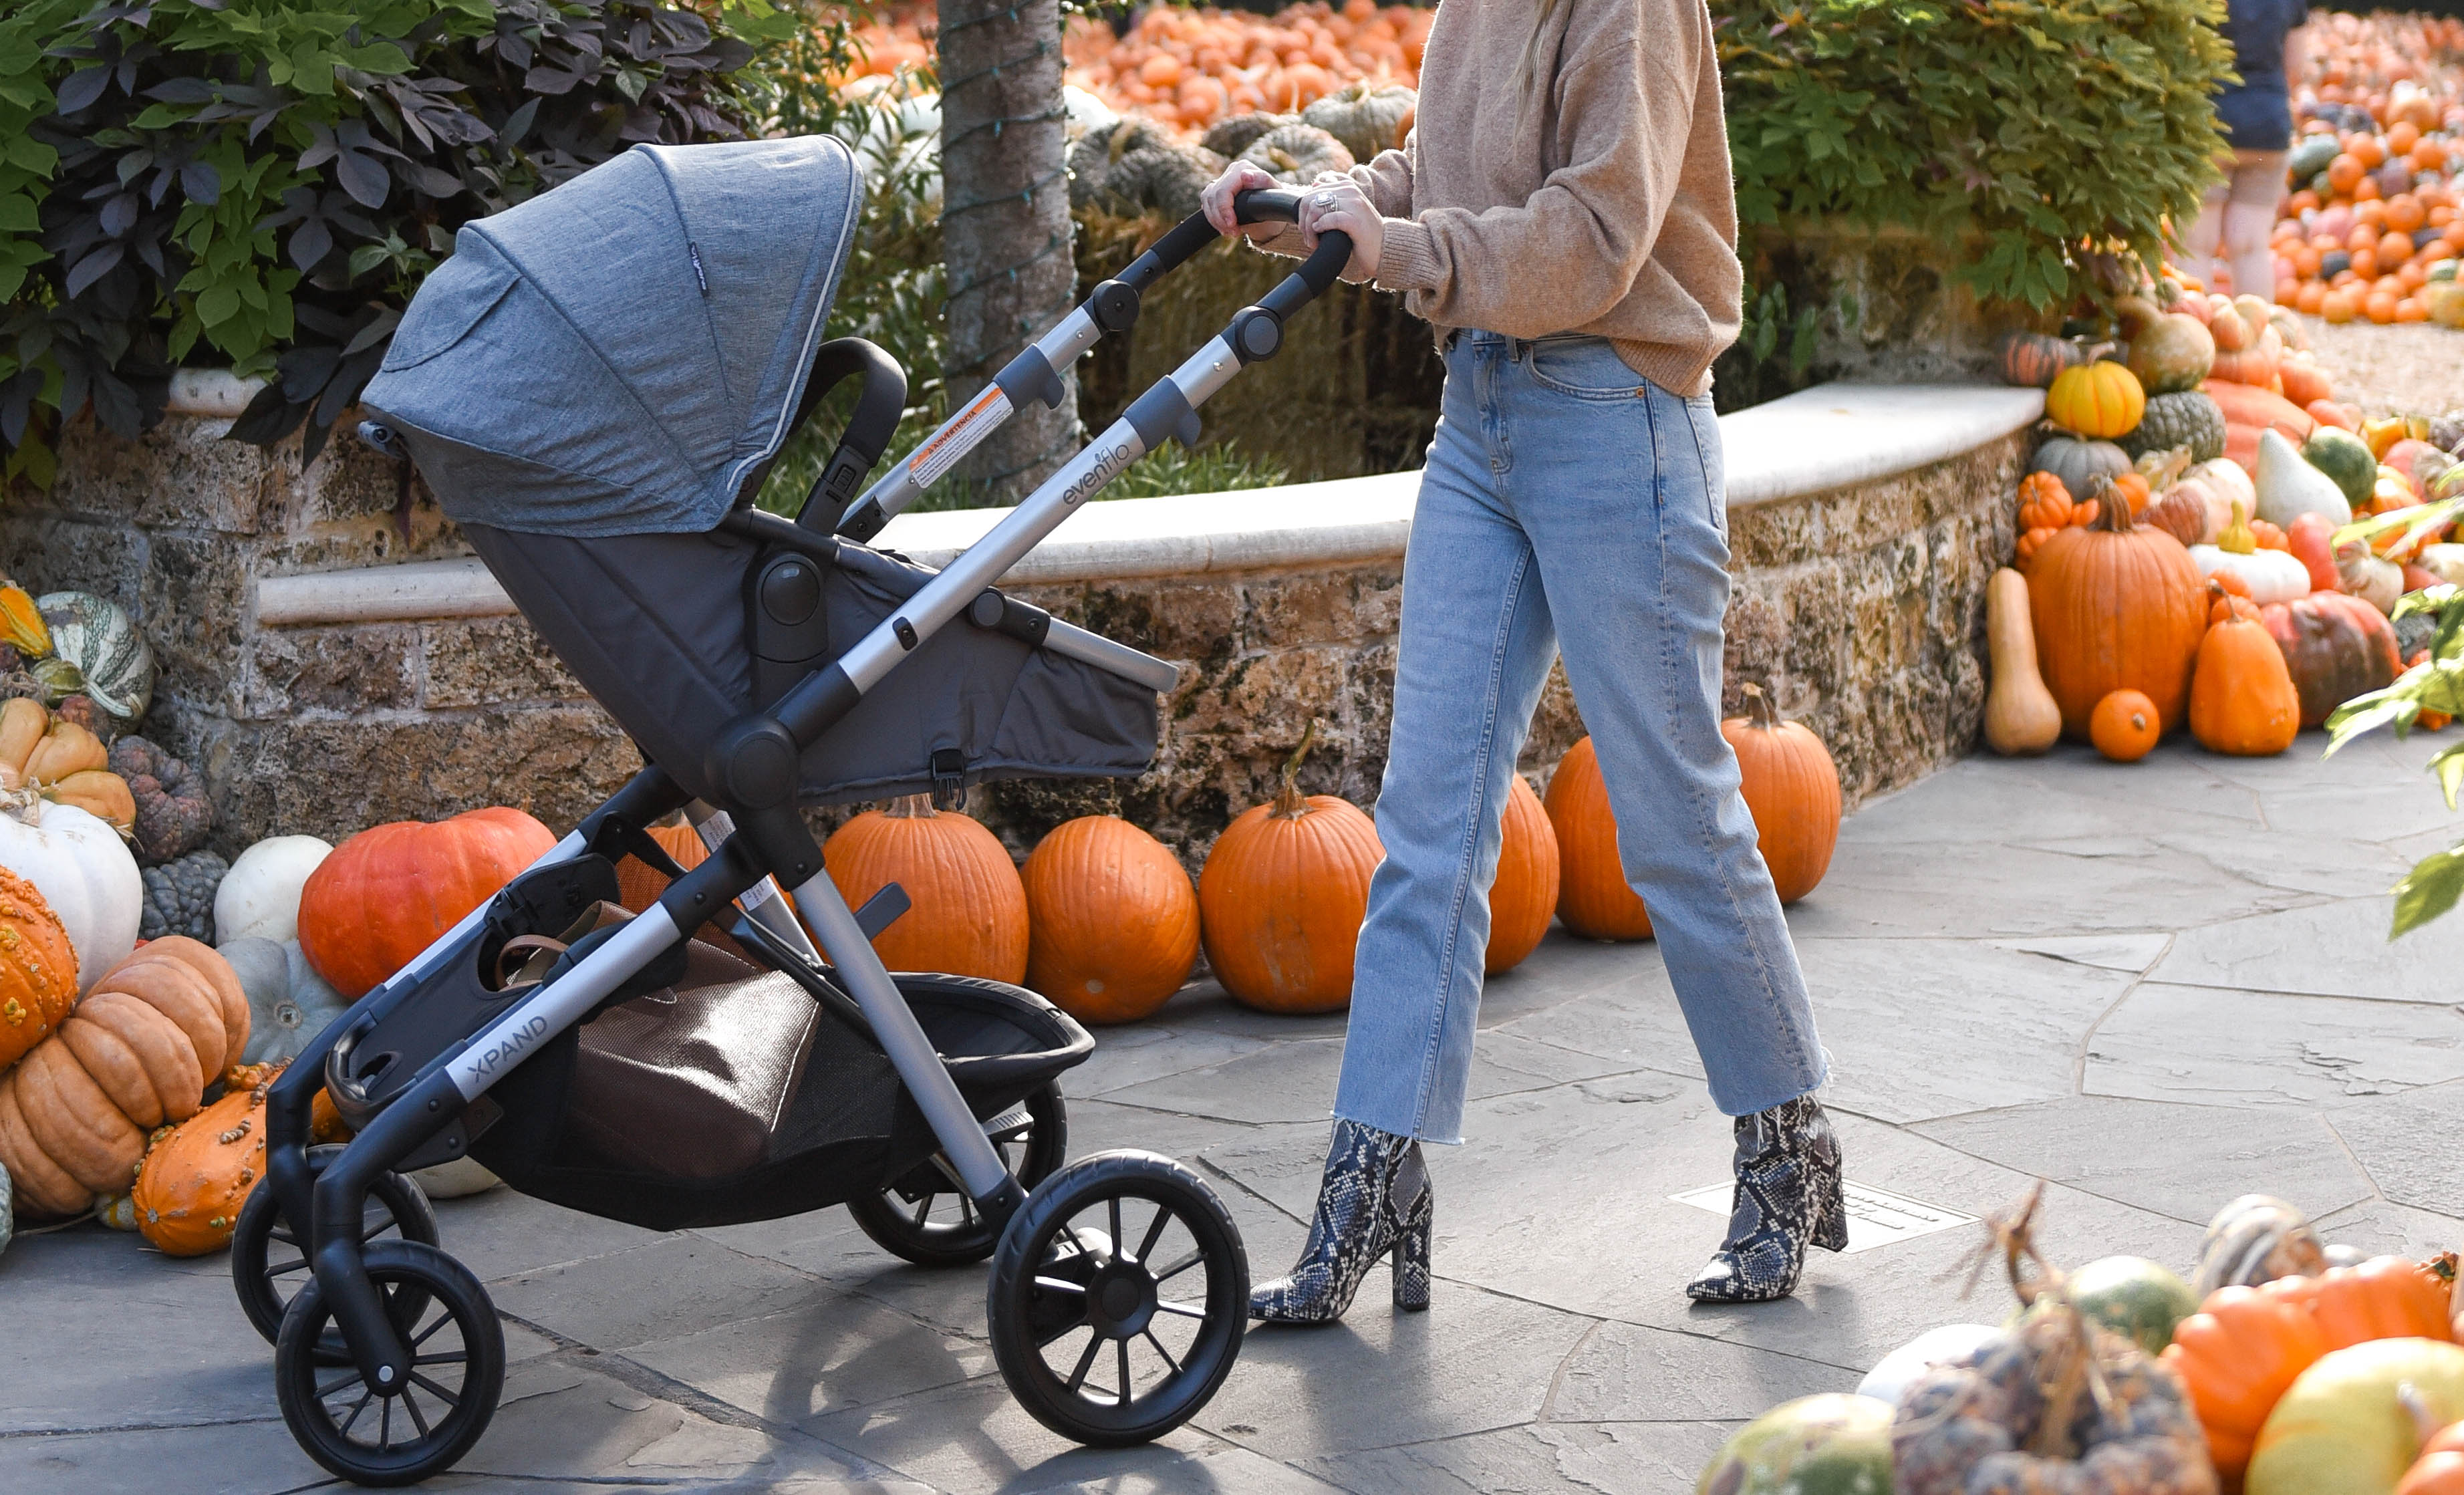 walmart-baby-stroller-lo-murphy-evenflo-stroller-dallas-blogger